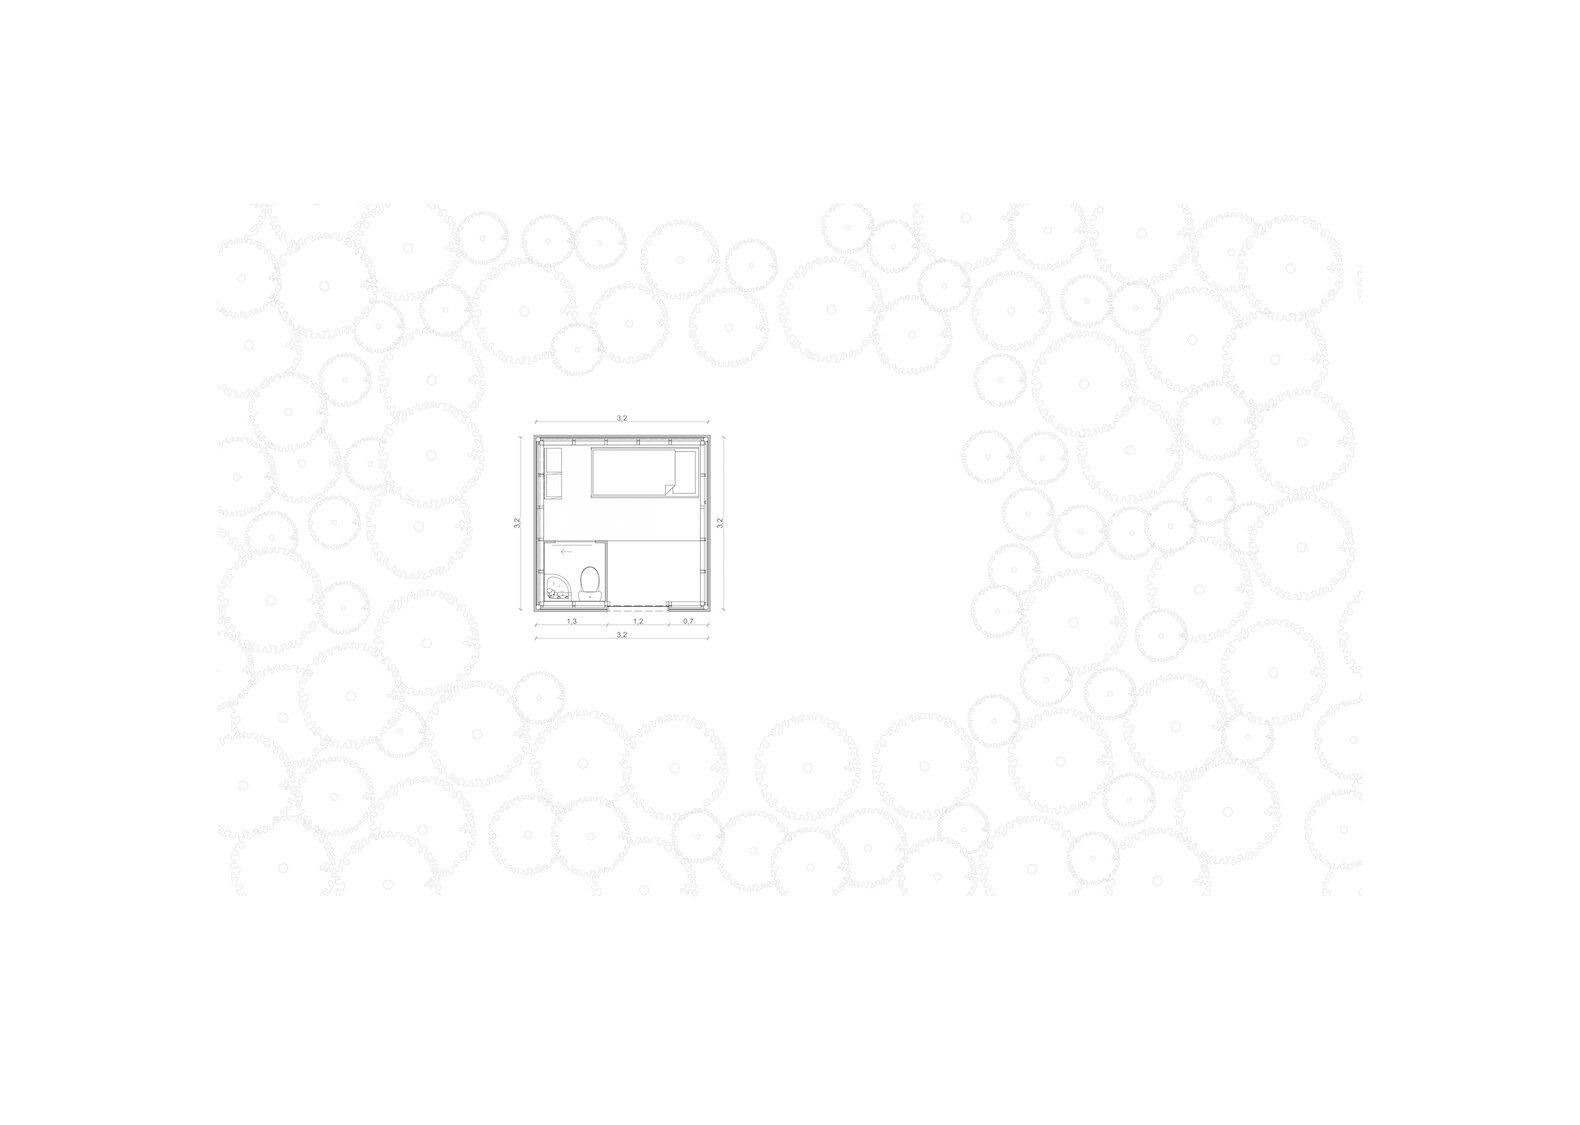 Refugio 3 x 3 upper floor plan